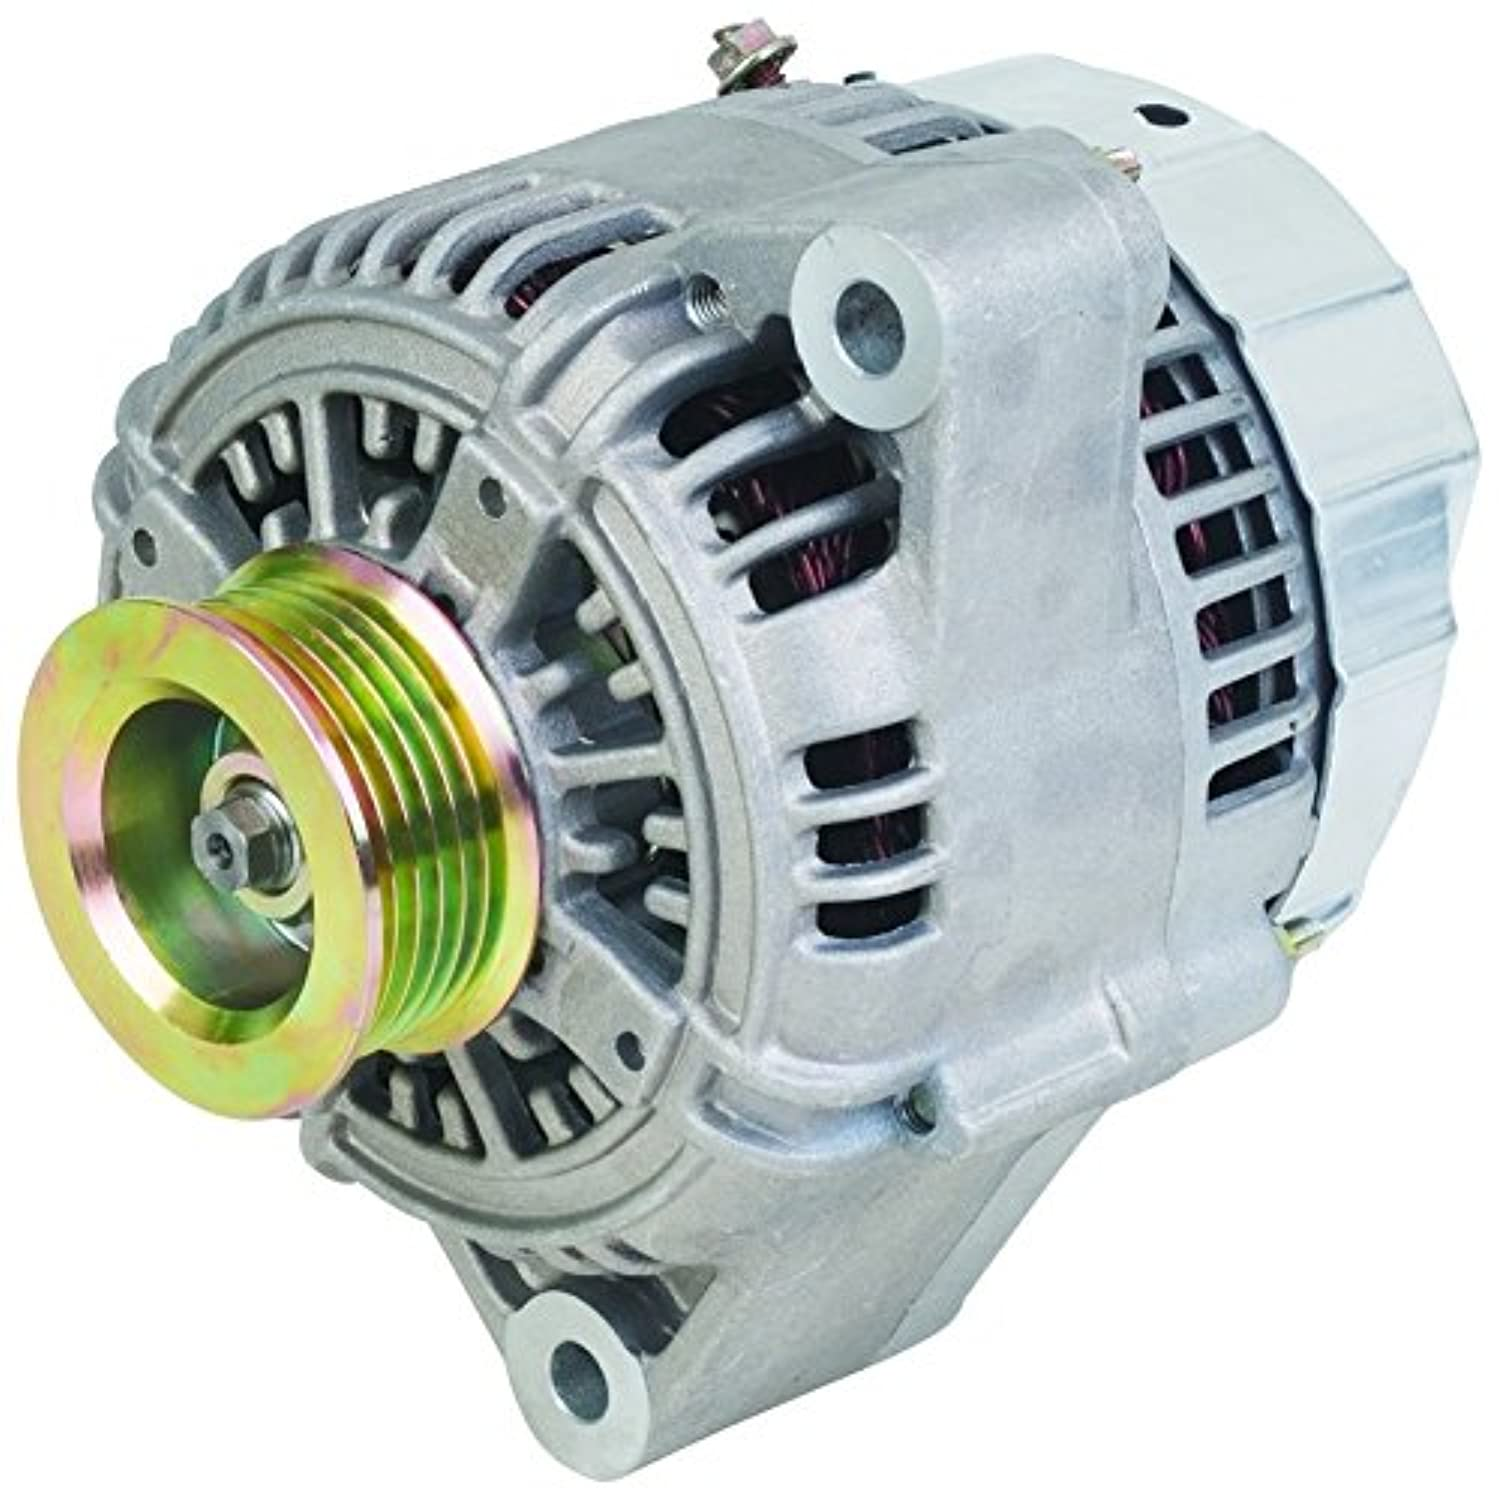 Premier Gear PG-13856 Professional Grade New Alternator